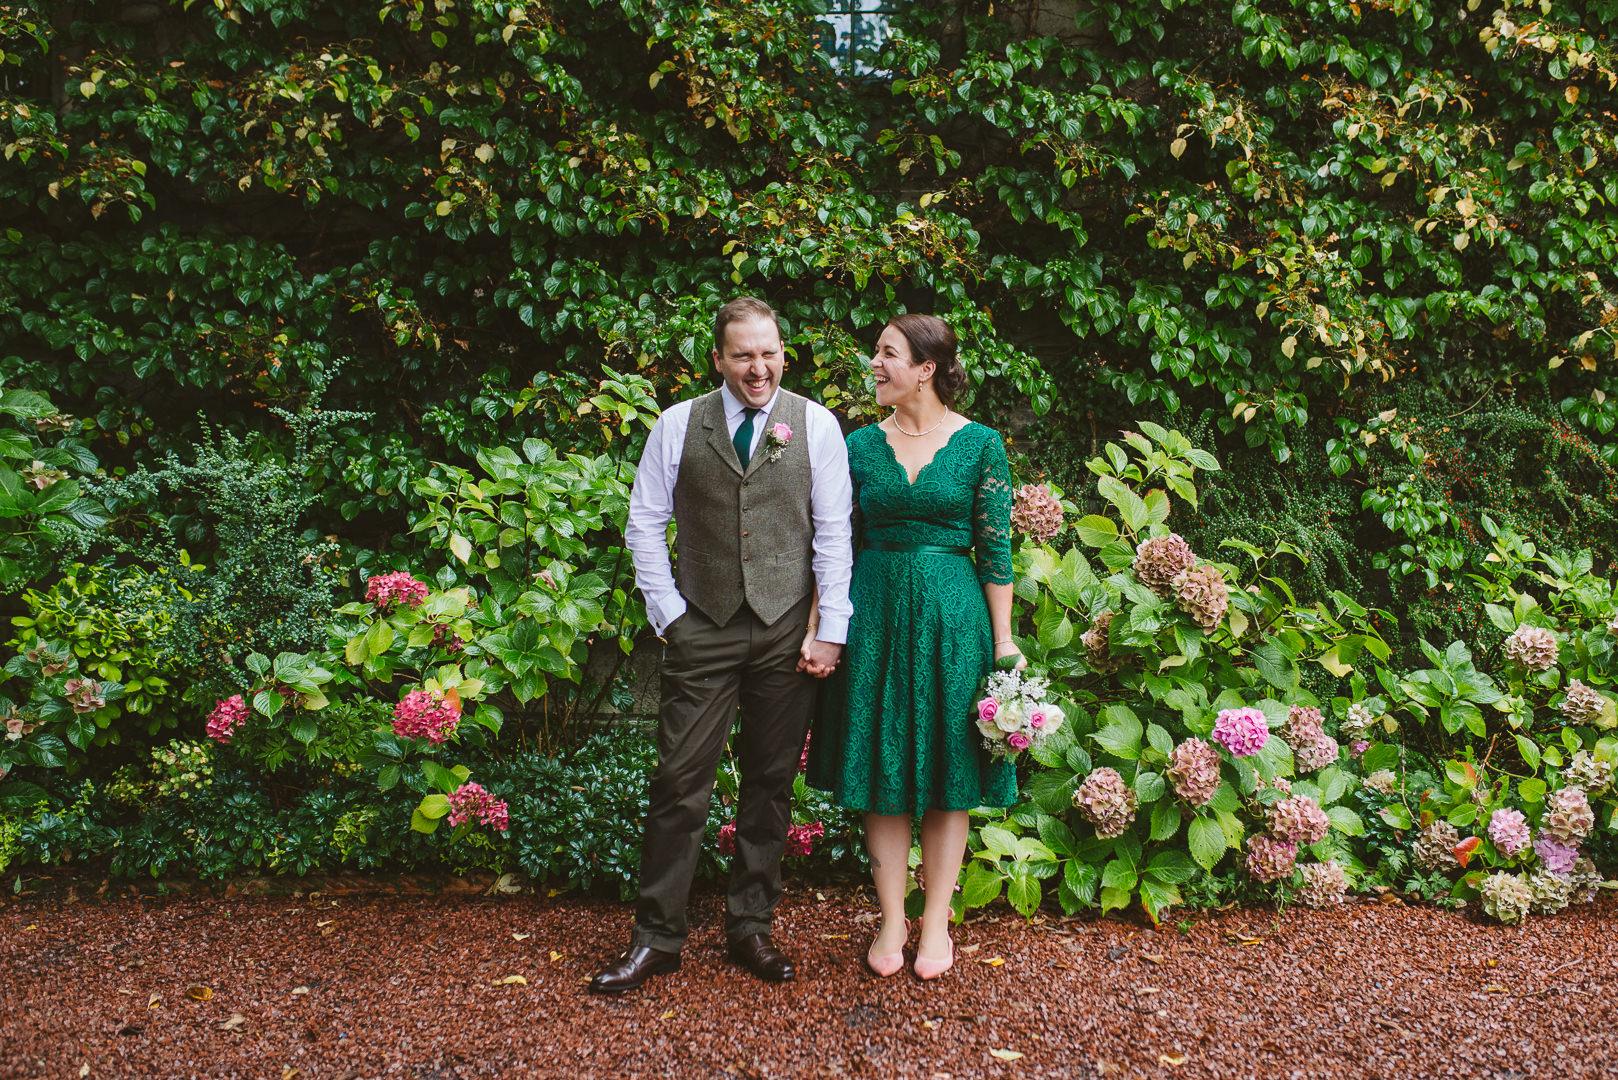 Edinburgh Elopment - From my best wedding photos from 2019